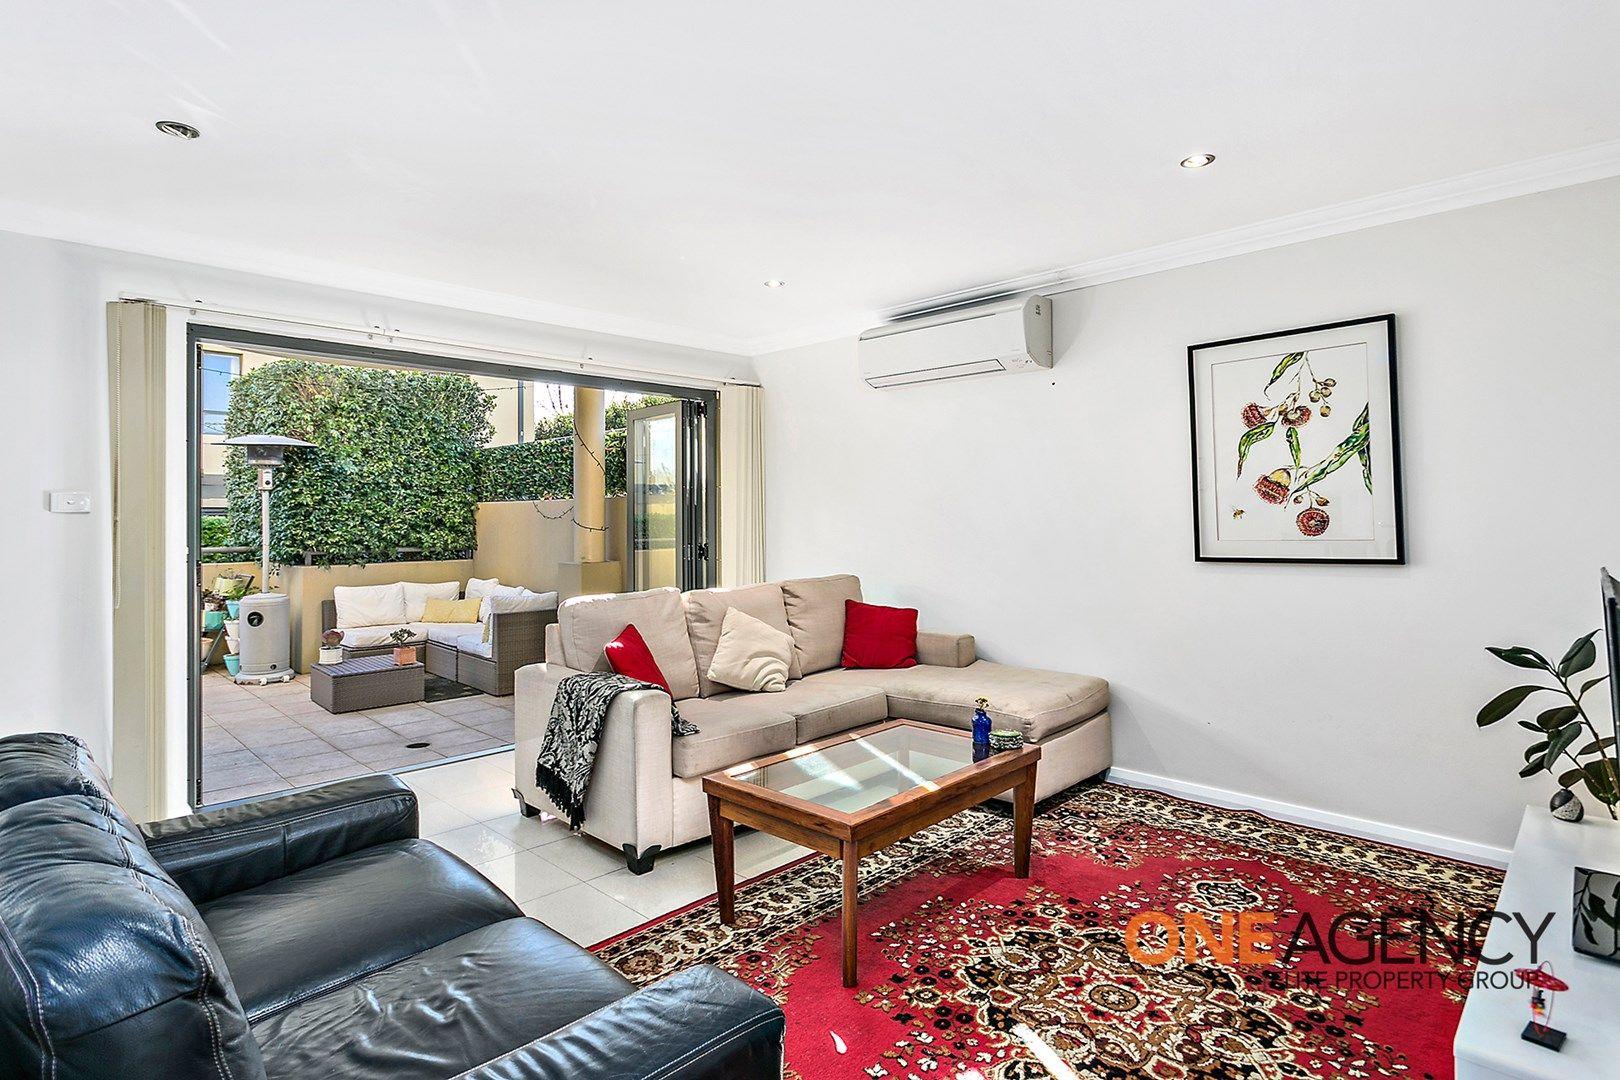 43 71-83 Smith Street, Wollongong NSW 2500, Image 0